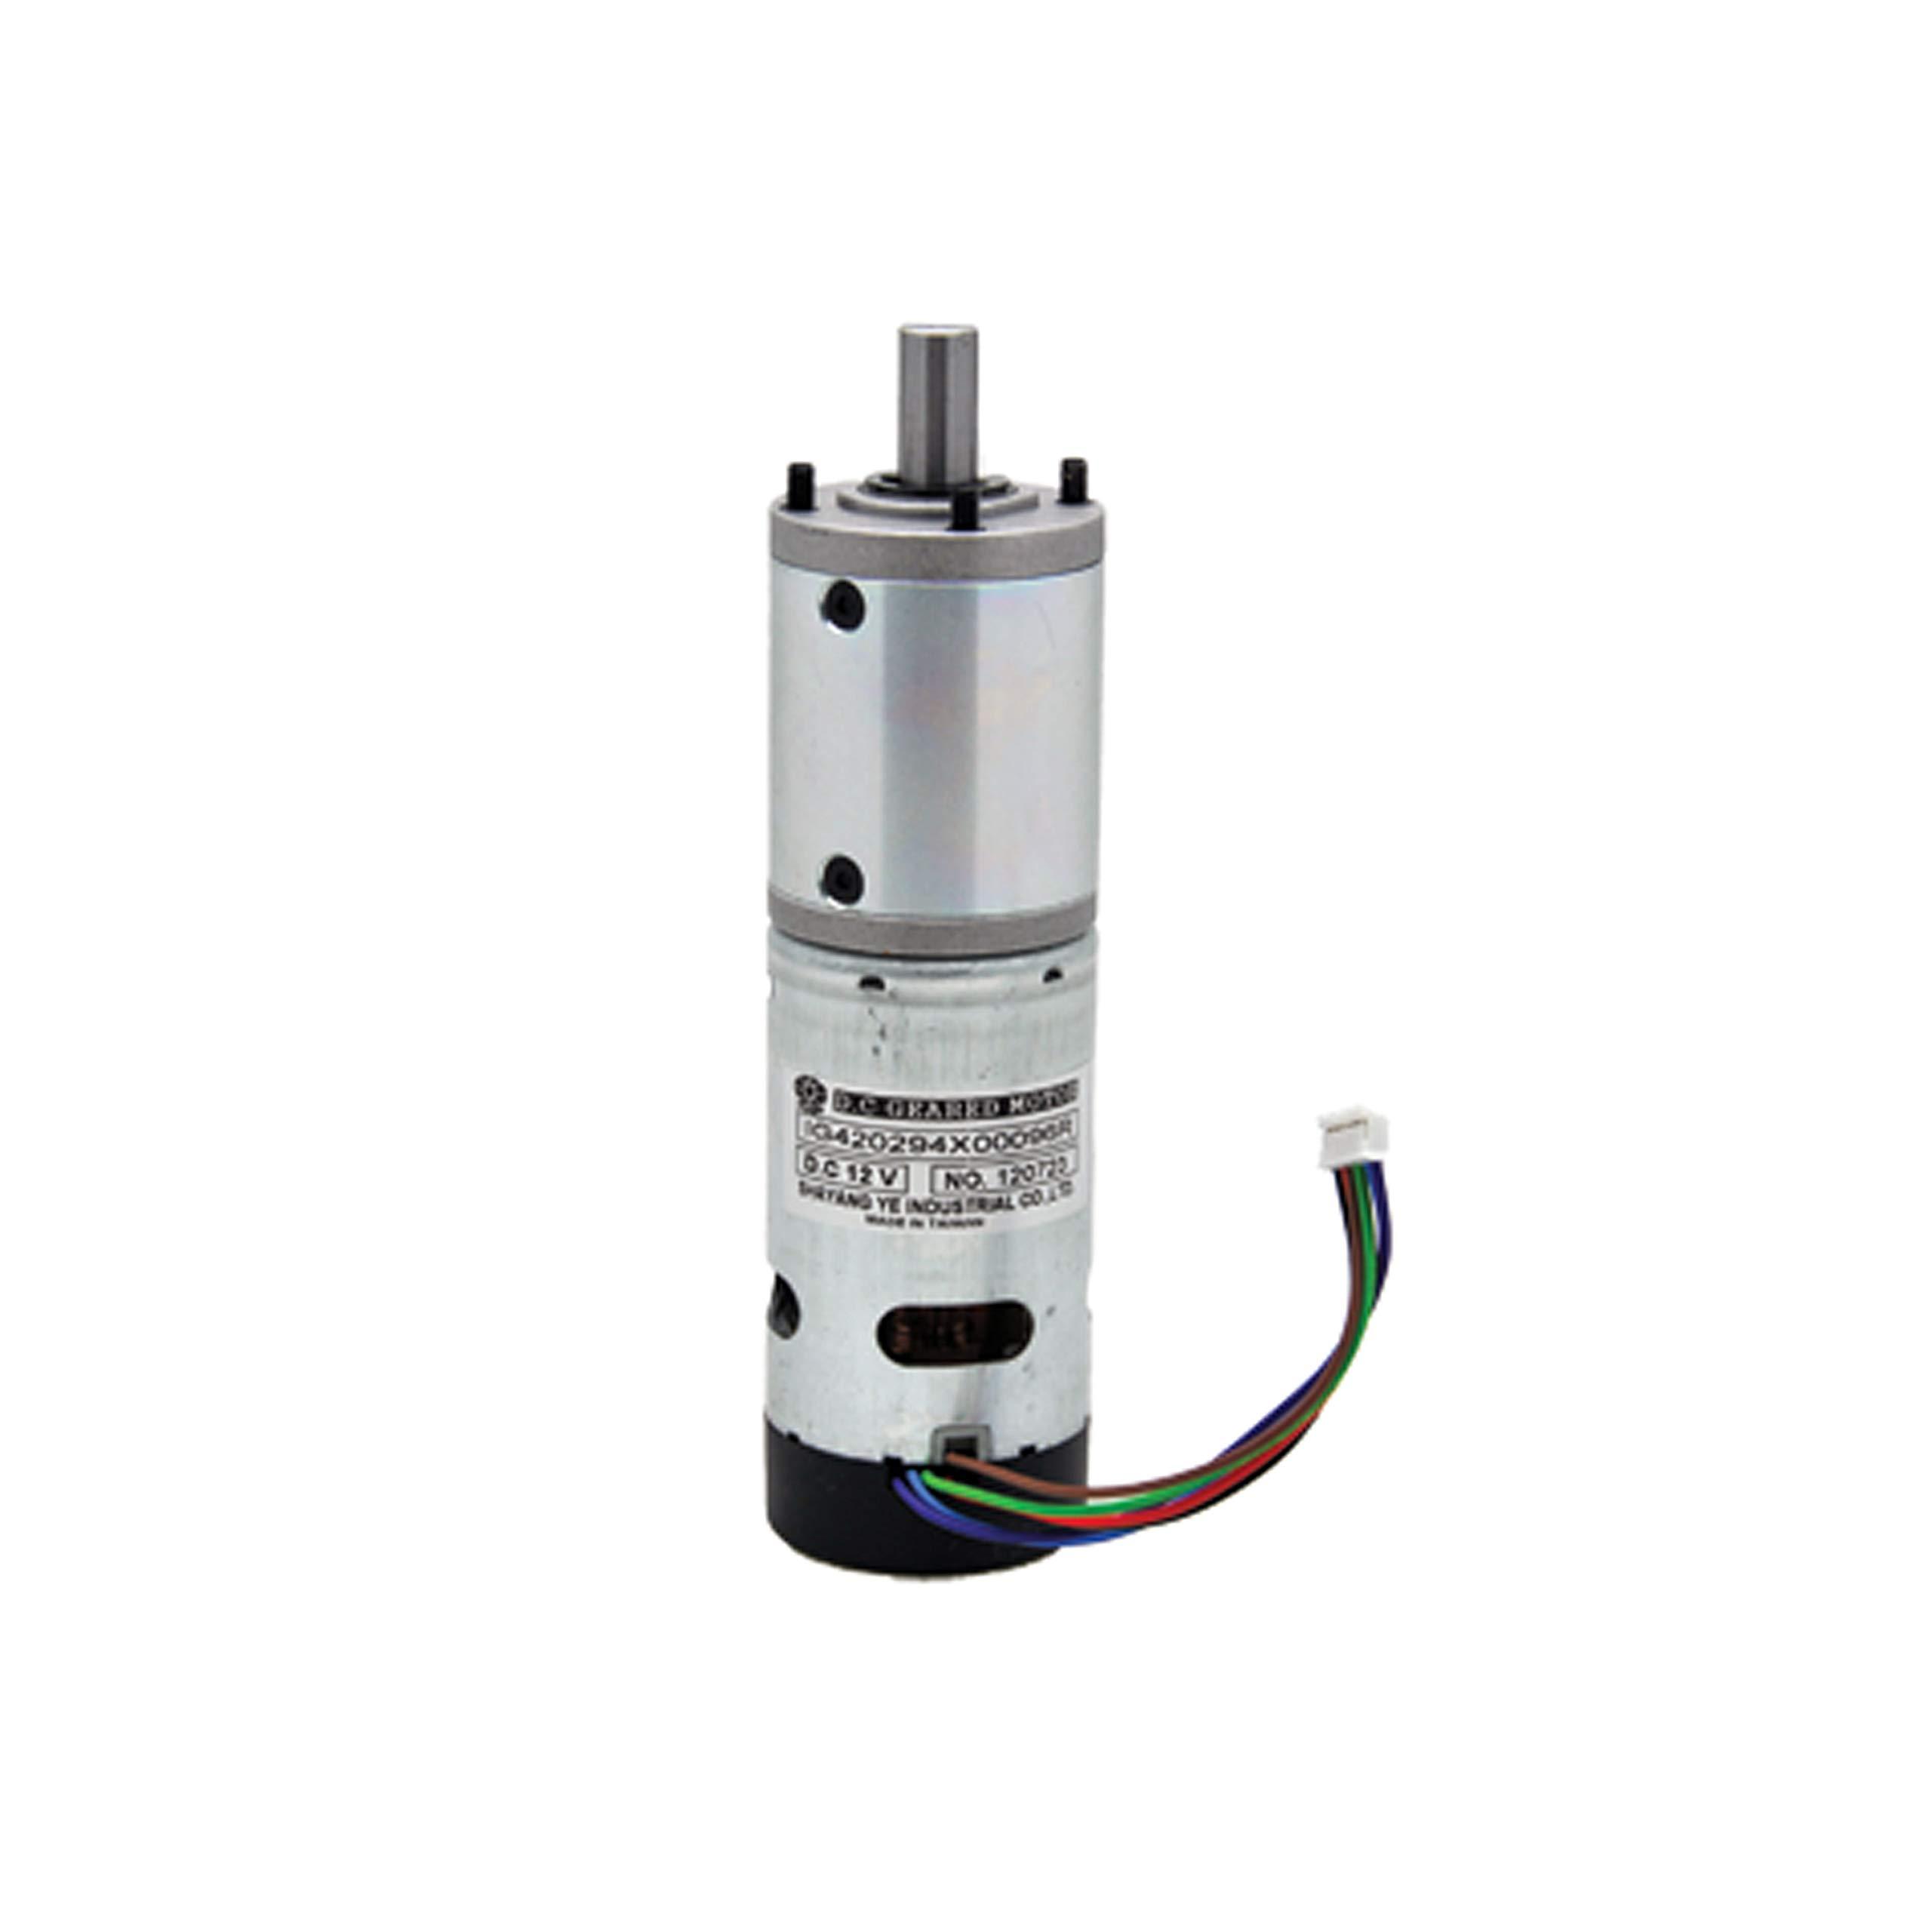 AP Products Lippert Components 236575 Motor Slide-Out Ig-42 10Mm 12V